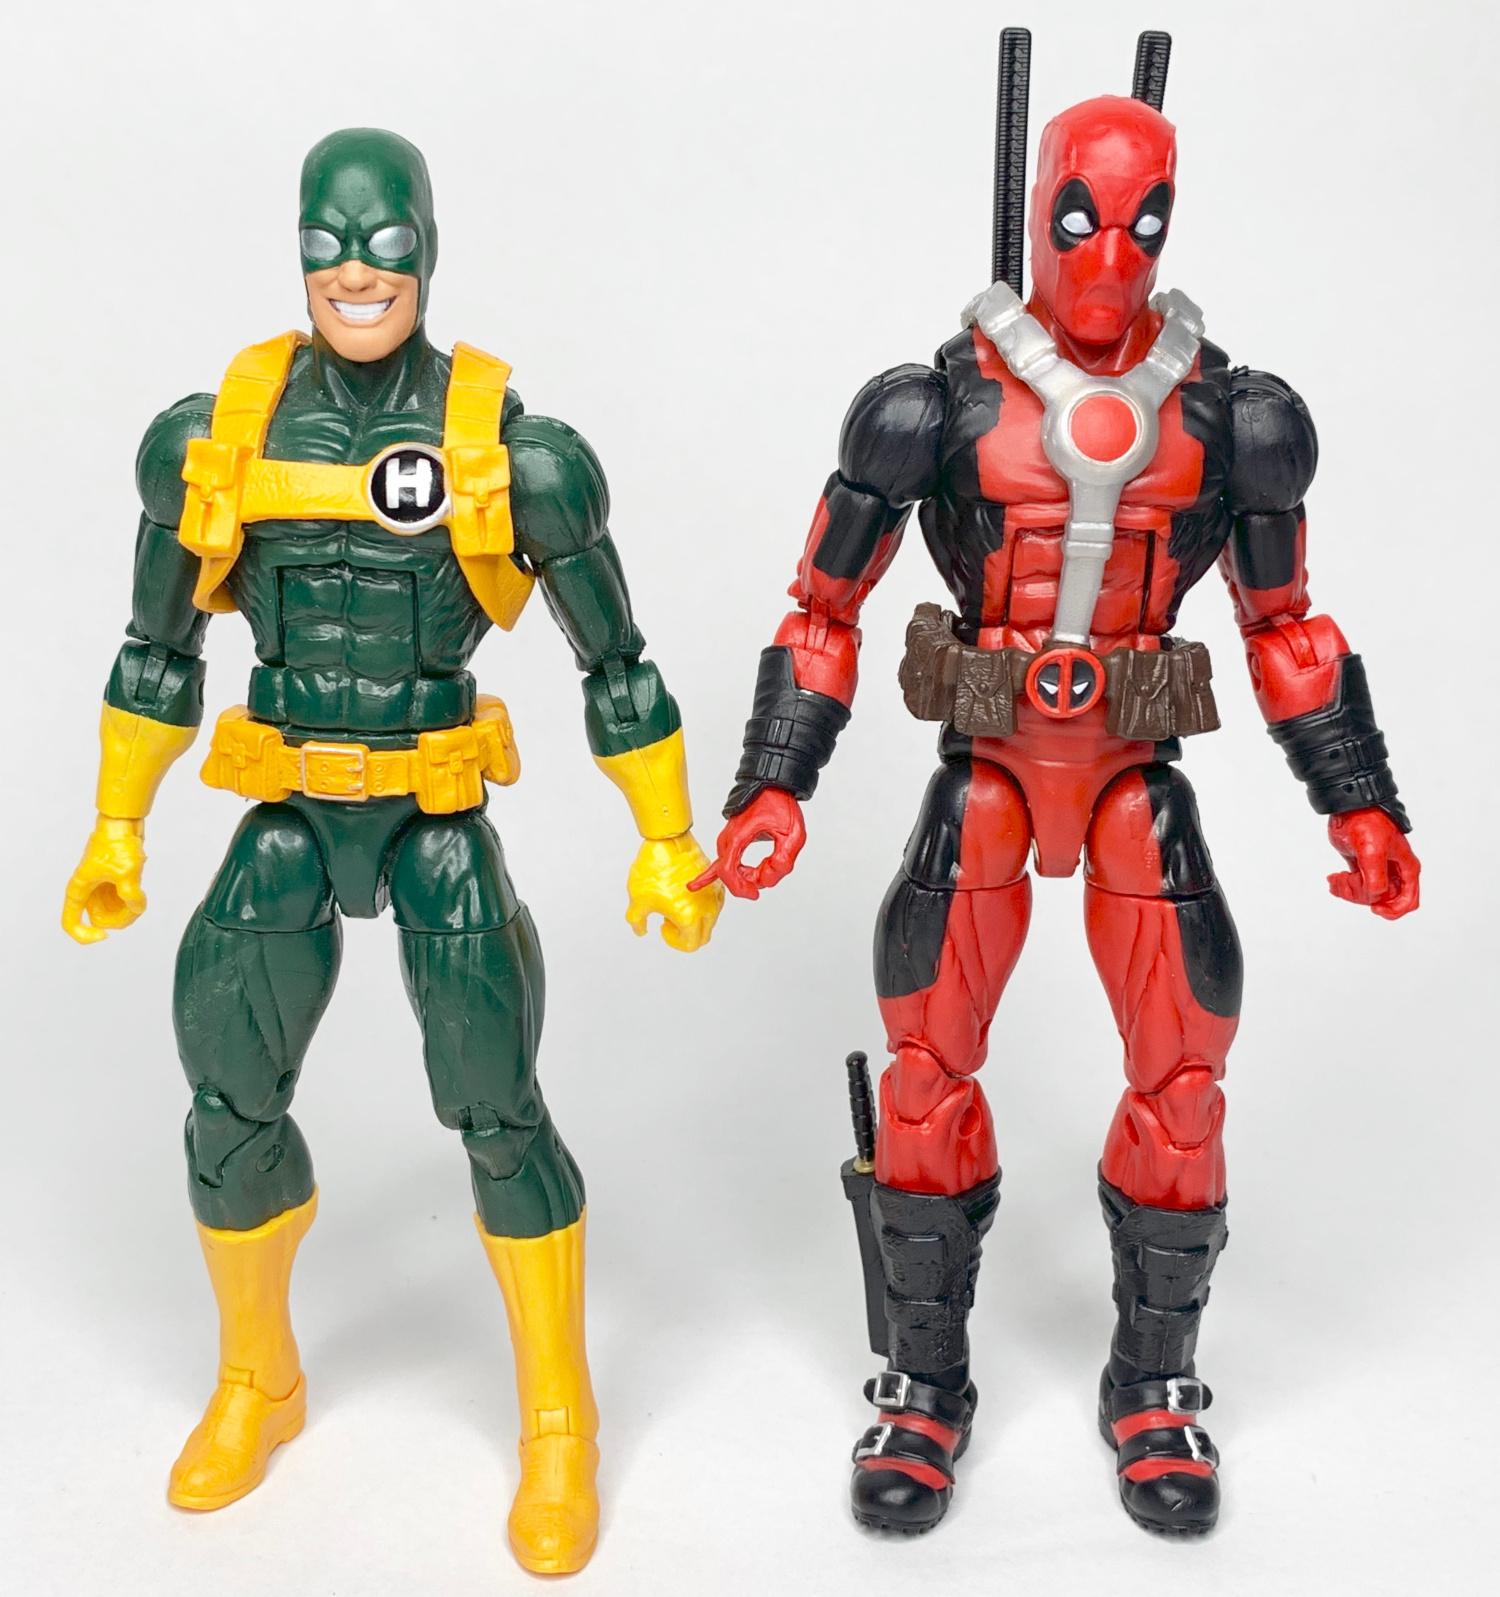 Hasbro: Marvel Legends Vehicles Professor X And Scooter